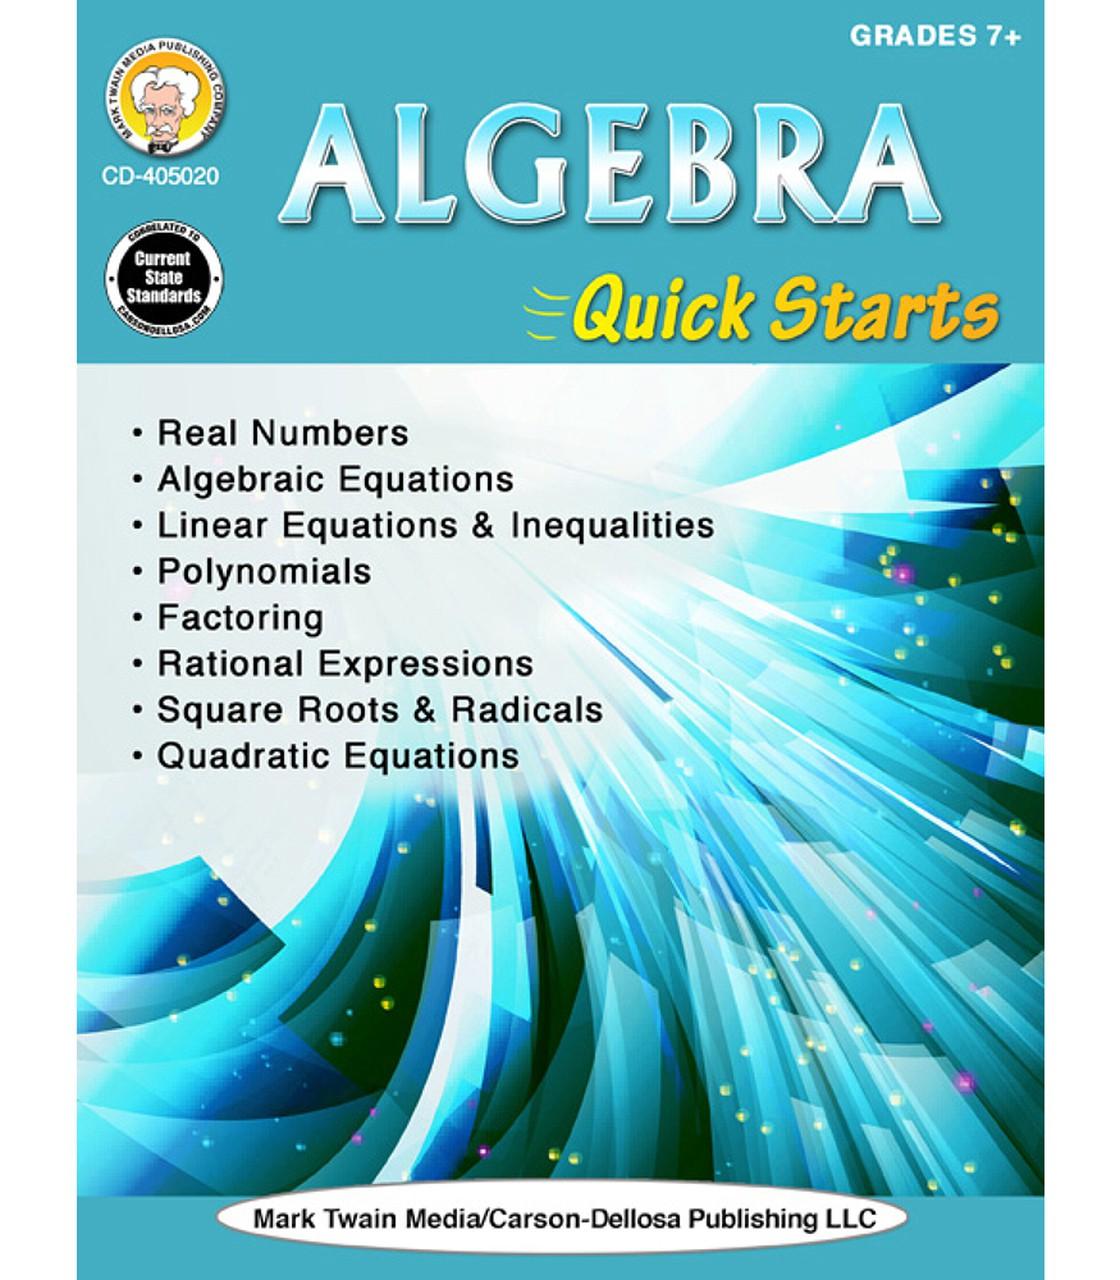 Algebra Quick Starts